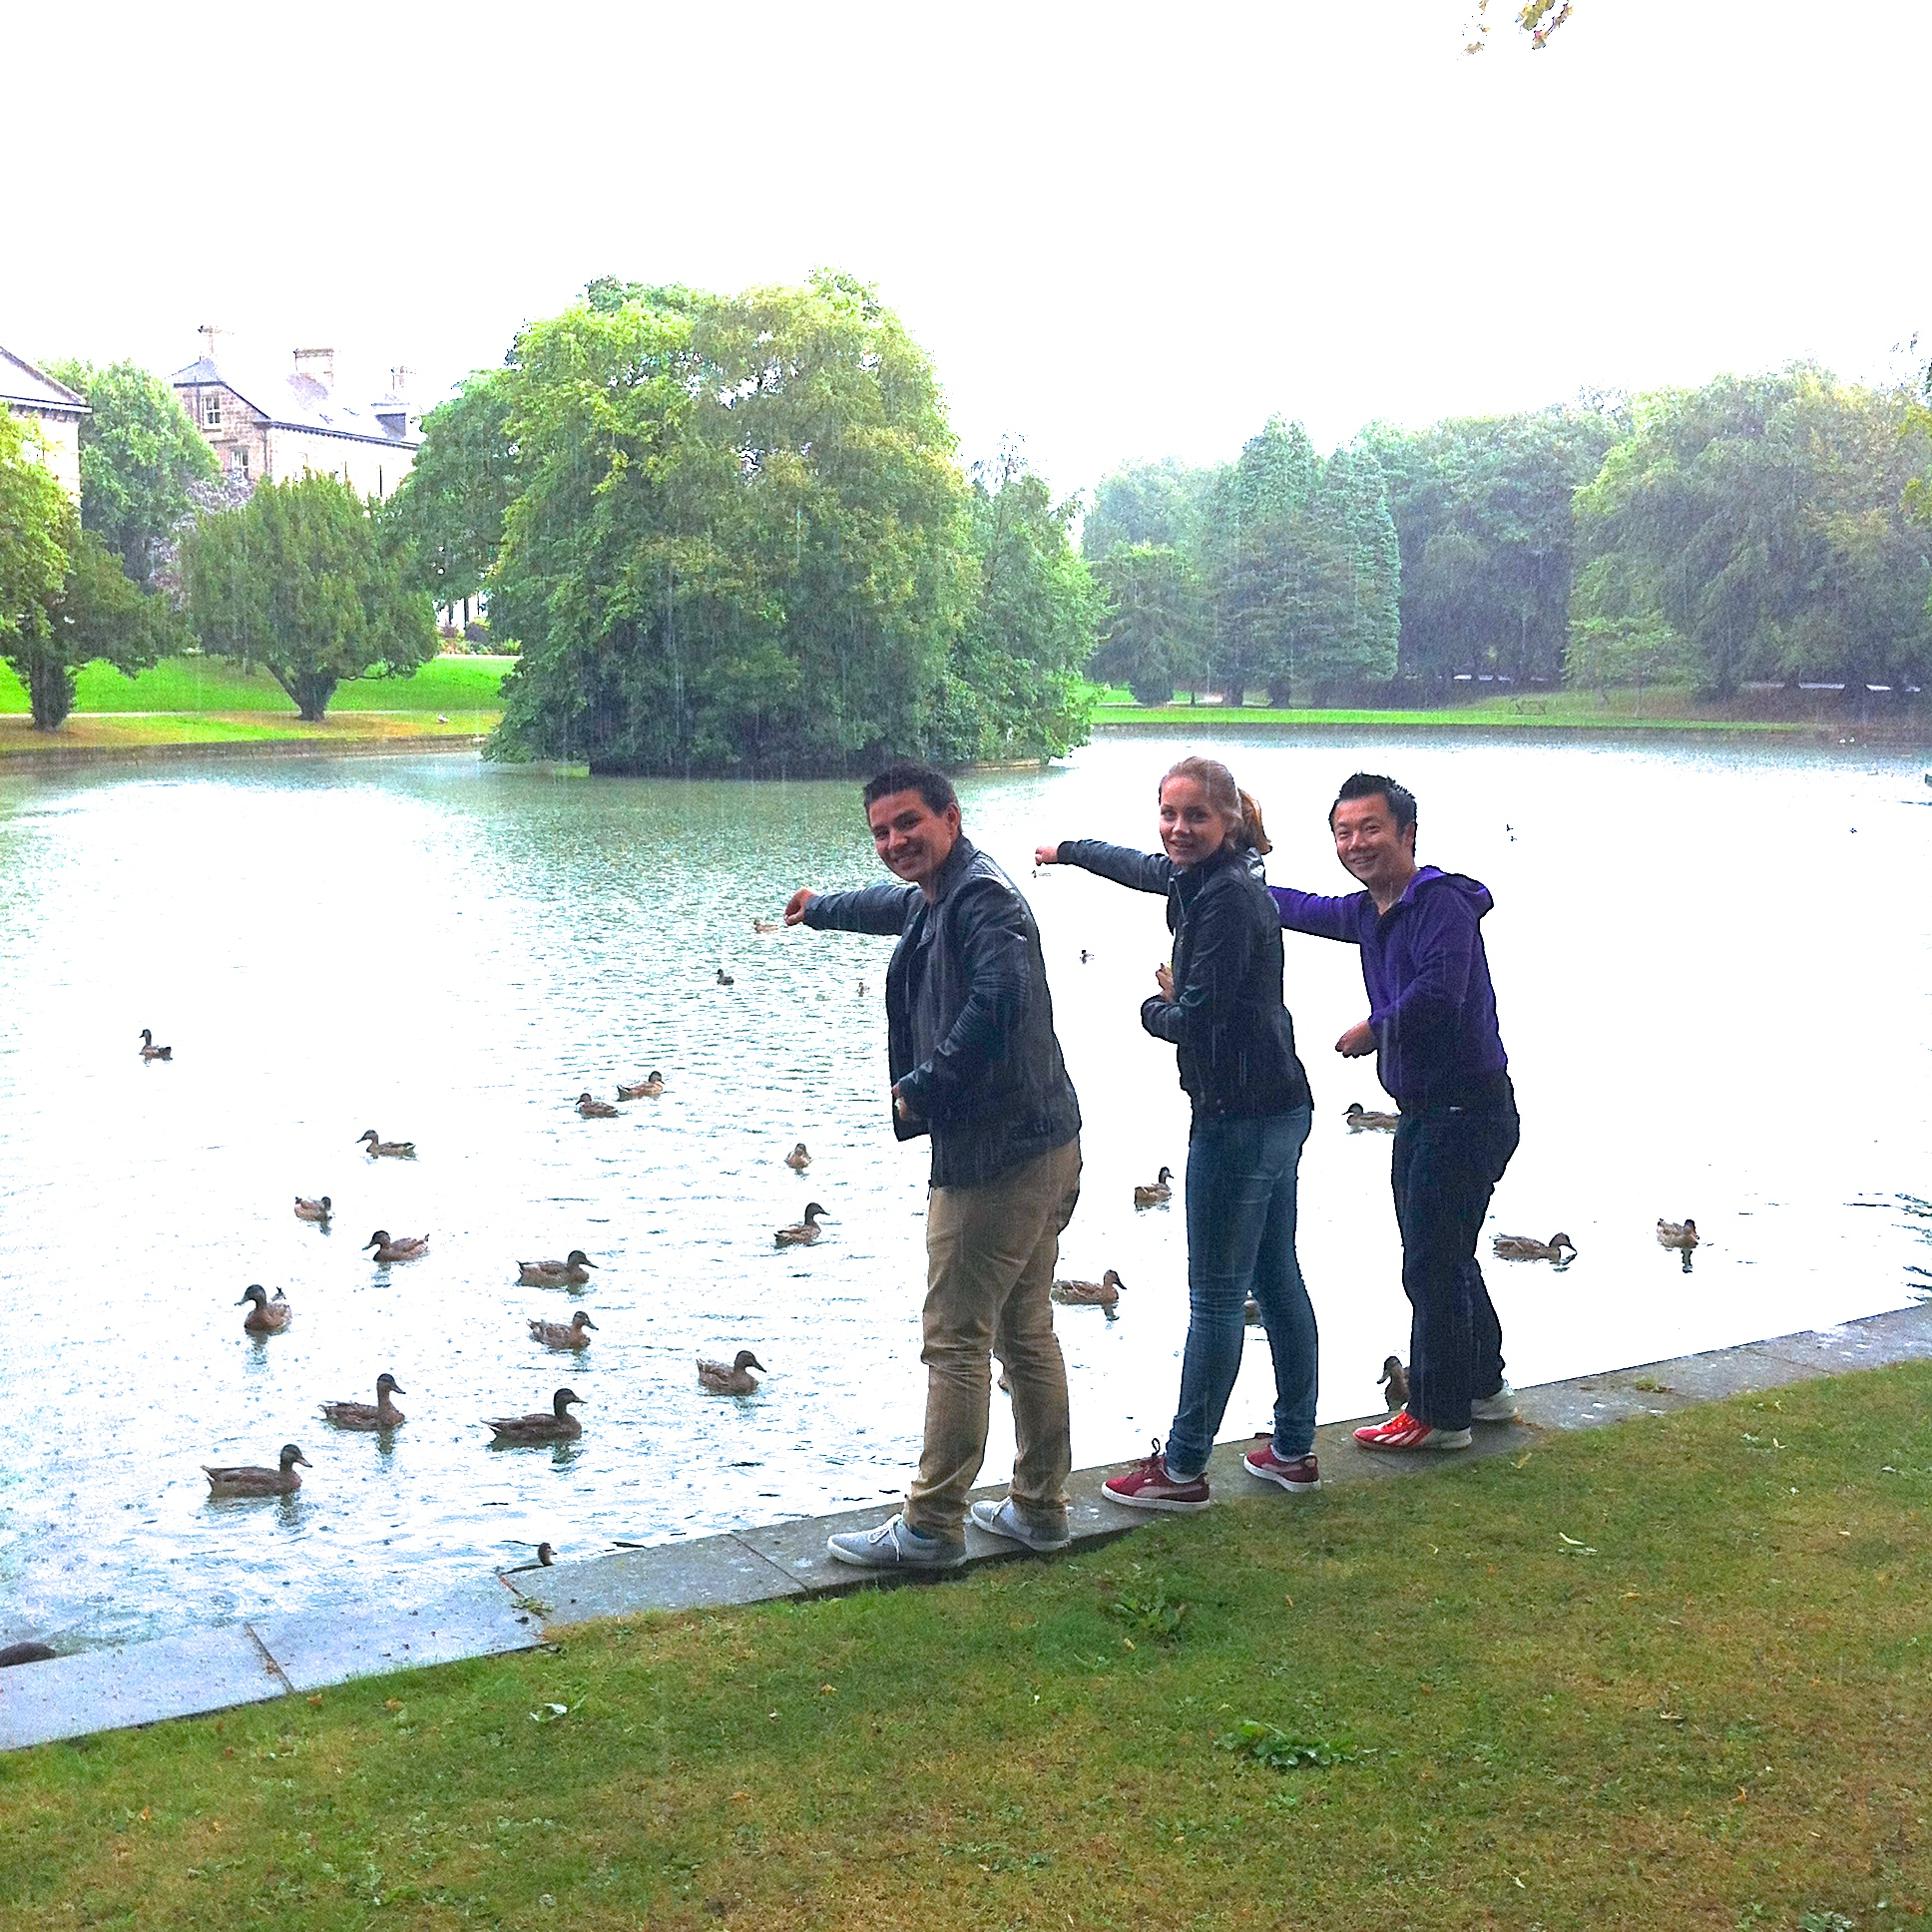 Feeding Ducks in the Rain